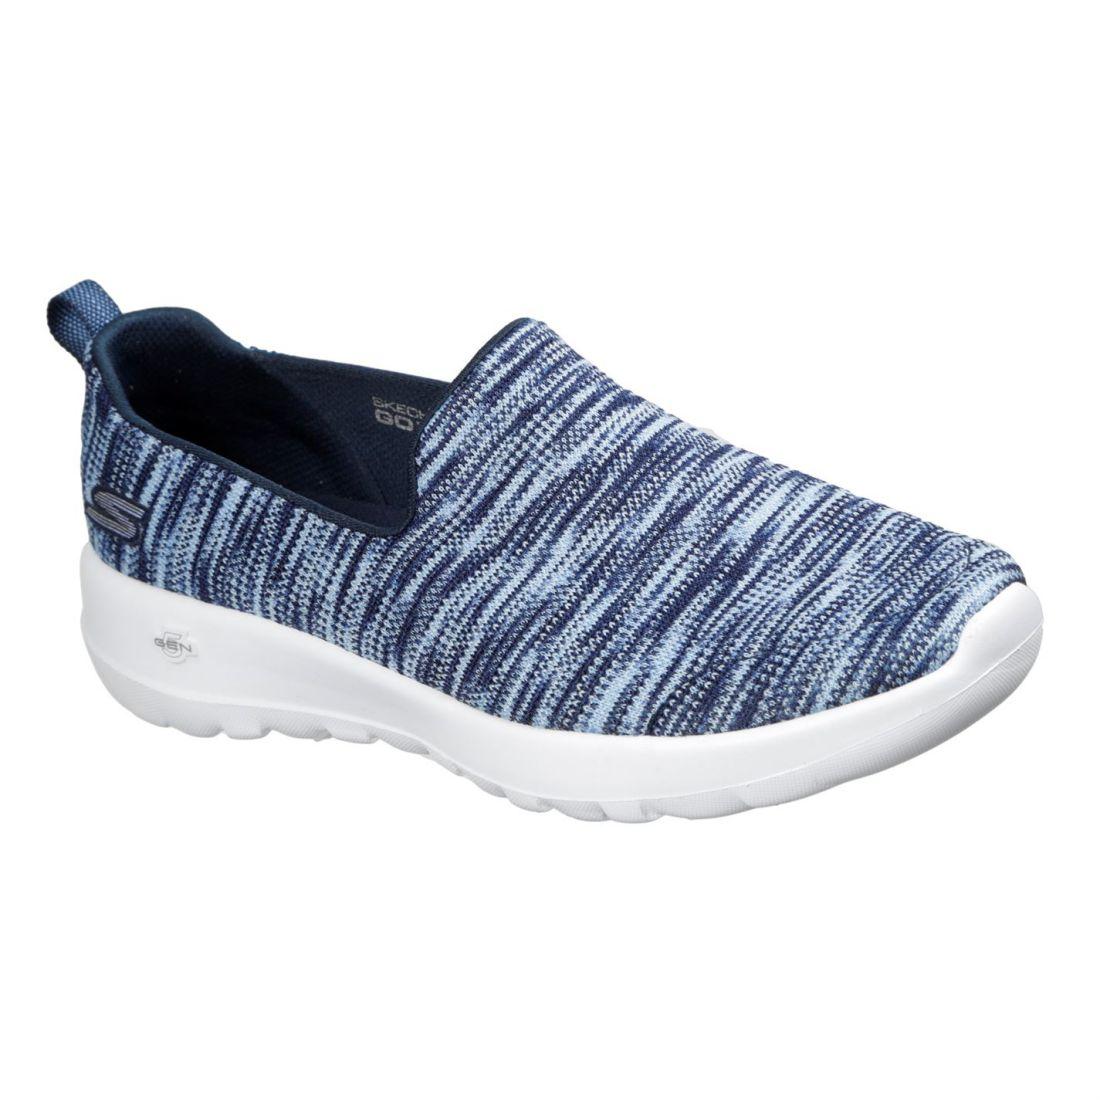 8275de305cb0 Skechers Womens Ladies GoWalk Joy Trainers Slip On Shoes Mesh Upper ...